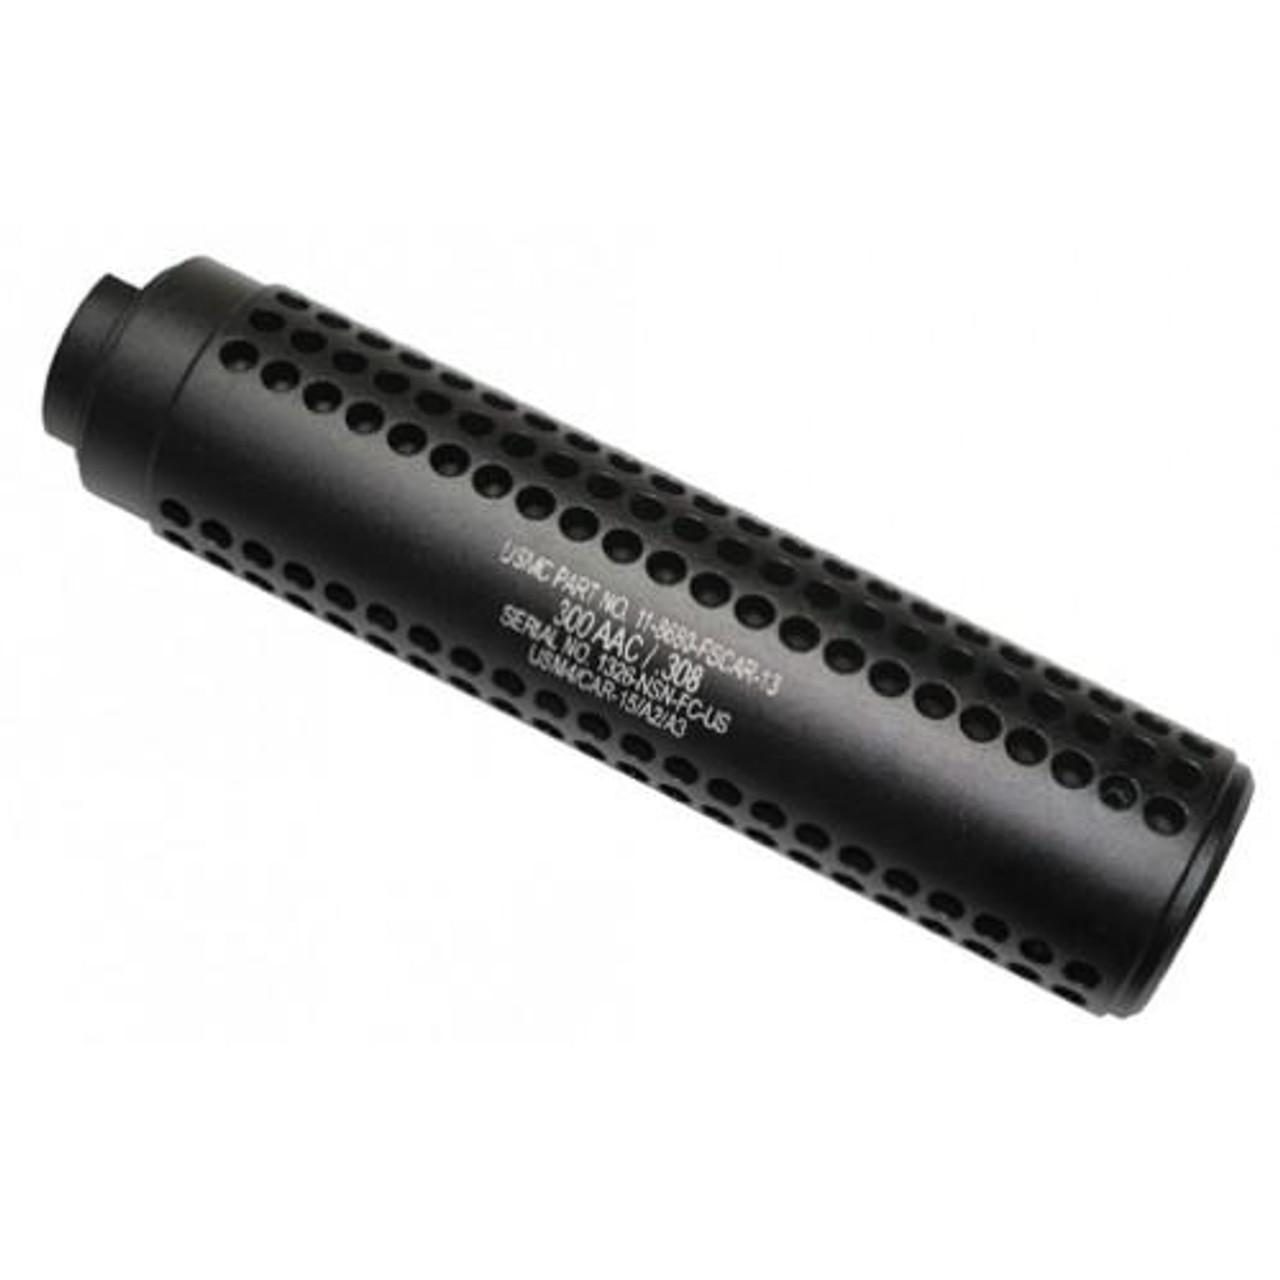 Guntech 308 AR Reverse Thread Slip Over SOCOM Style Fake Suppressor